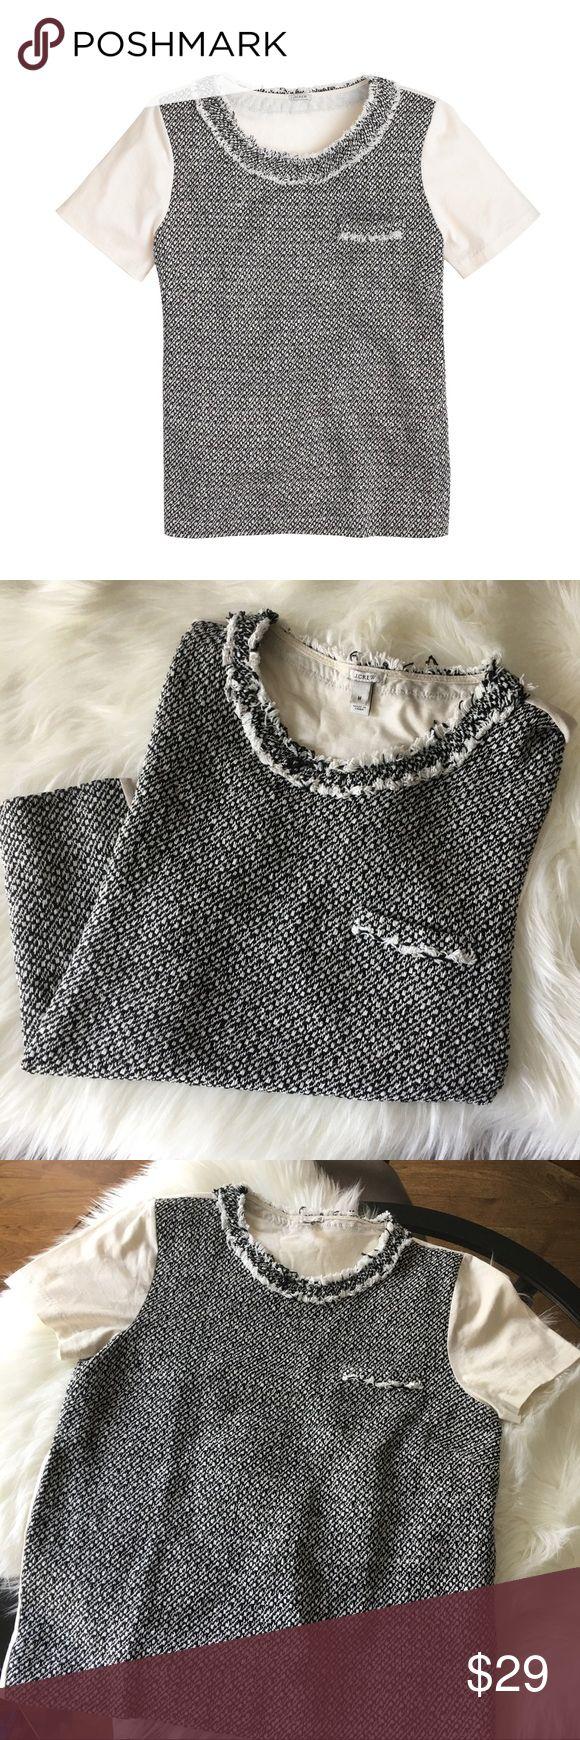 Tweed-Front Tee in Black J. Crew Size M Super cute tweed tee with pocket detailing. Size M J. Crew Tops Blouses